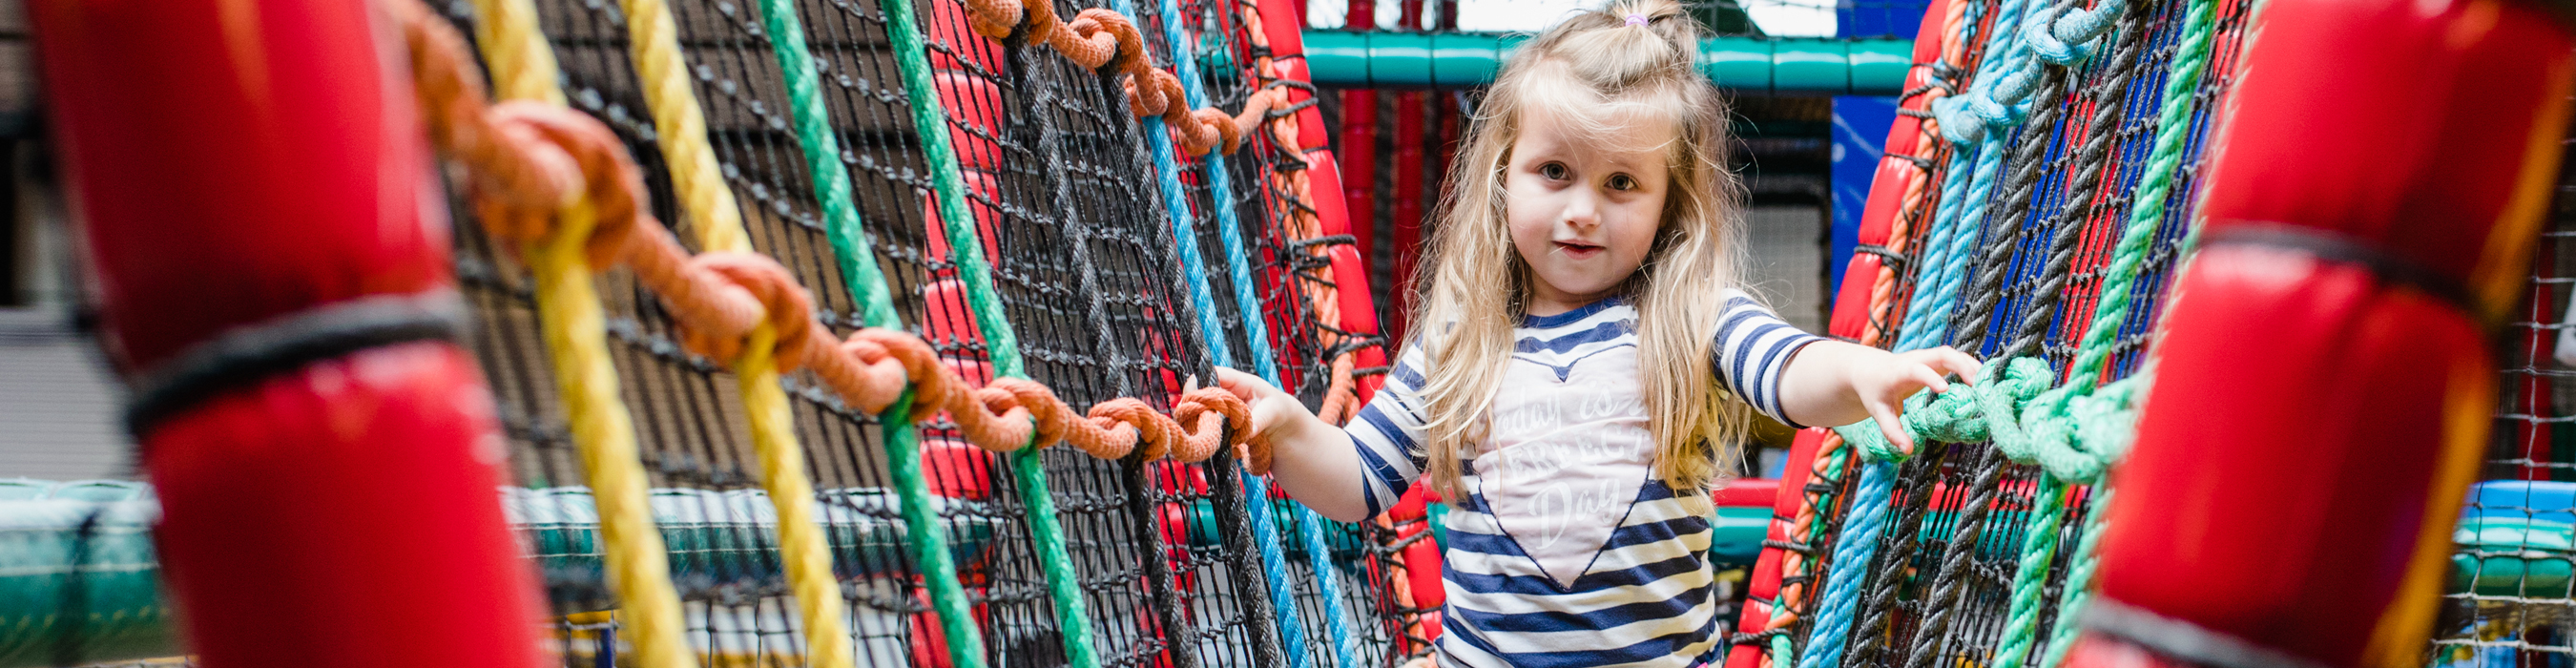 Afbeelding 4 - Kids Castle - Kinderspeelparadijs